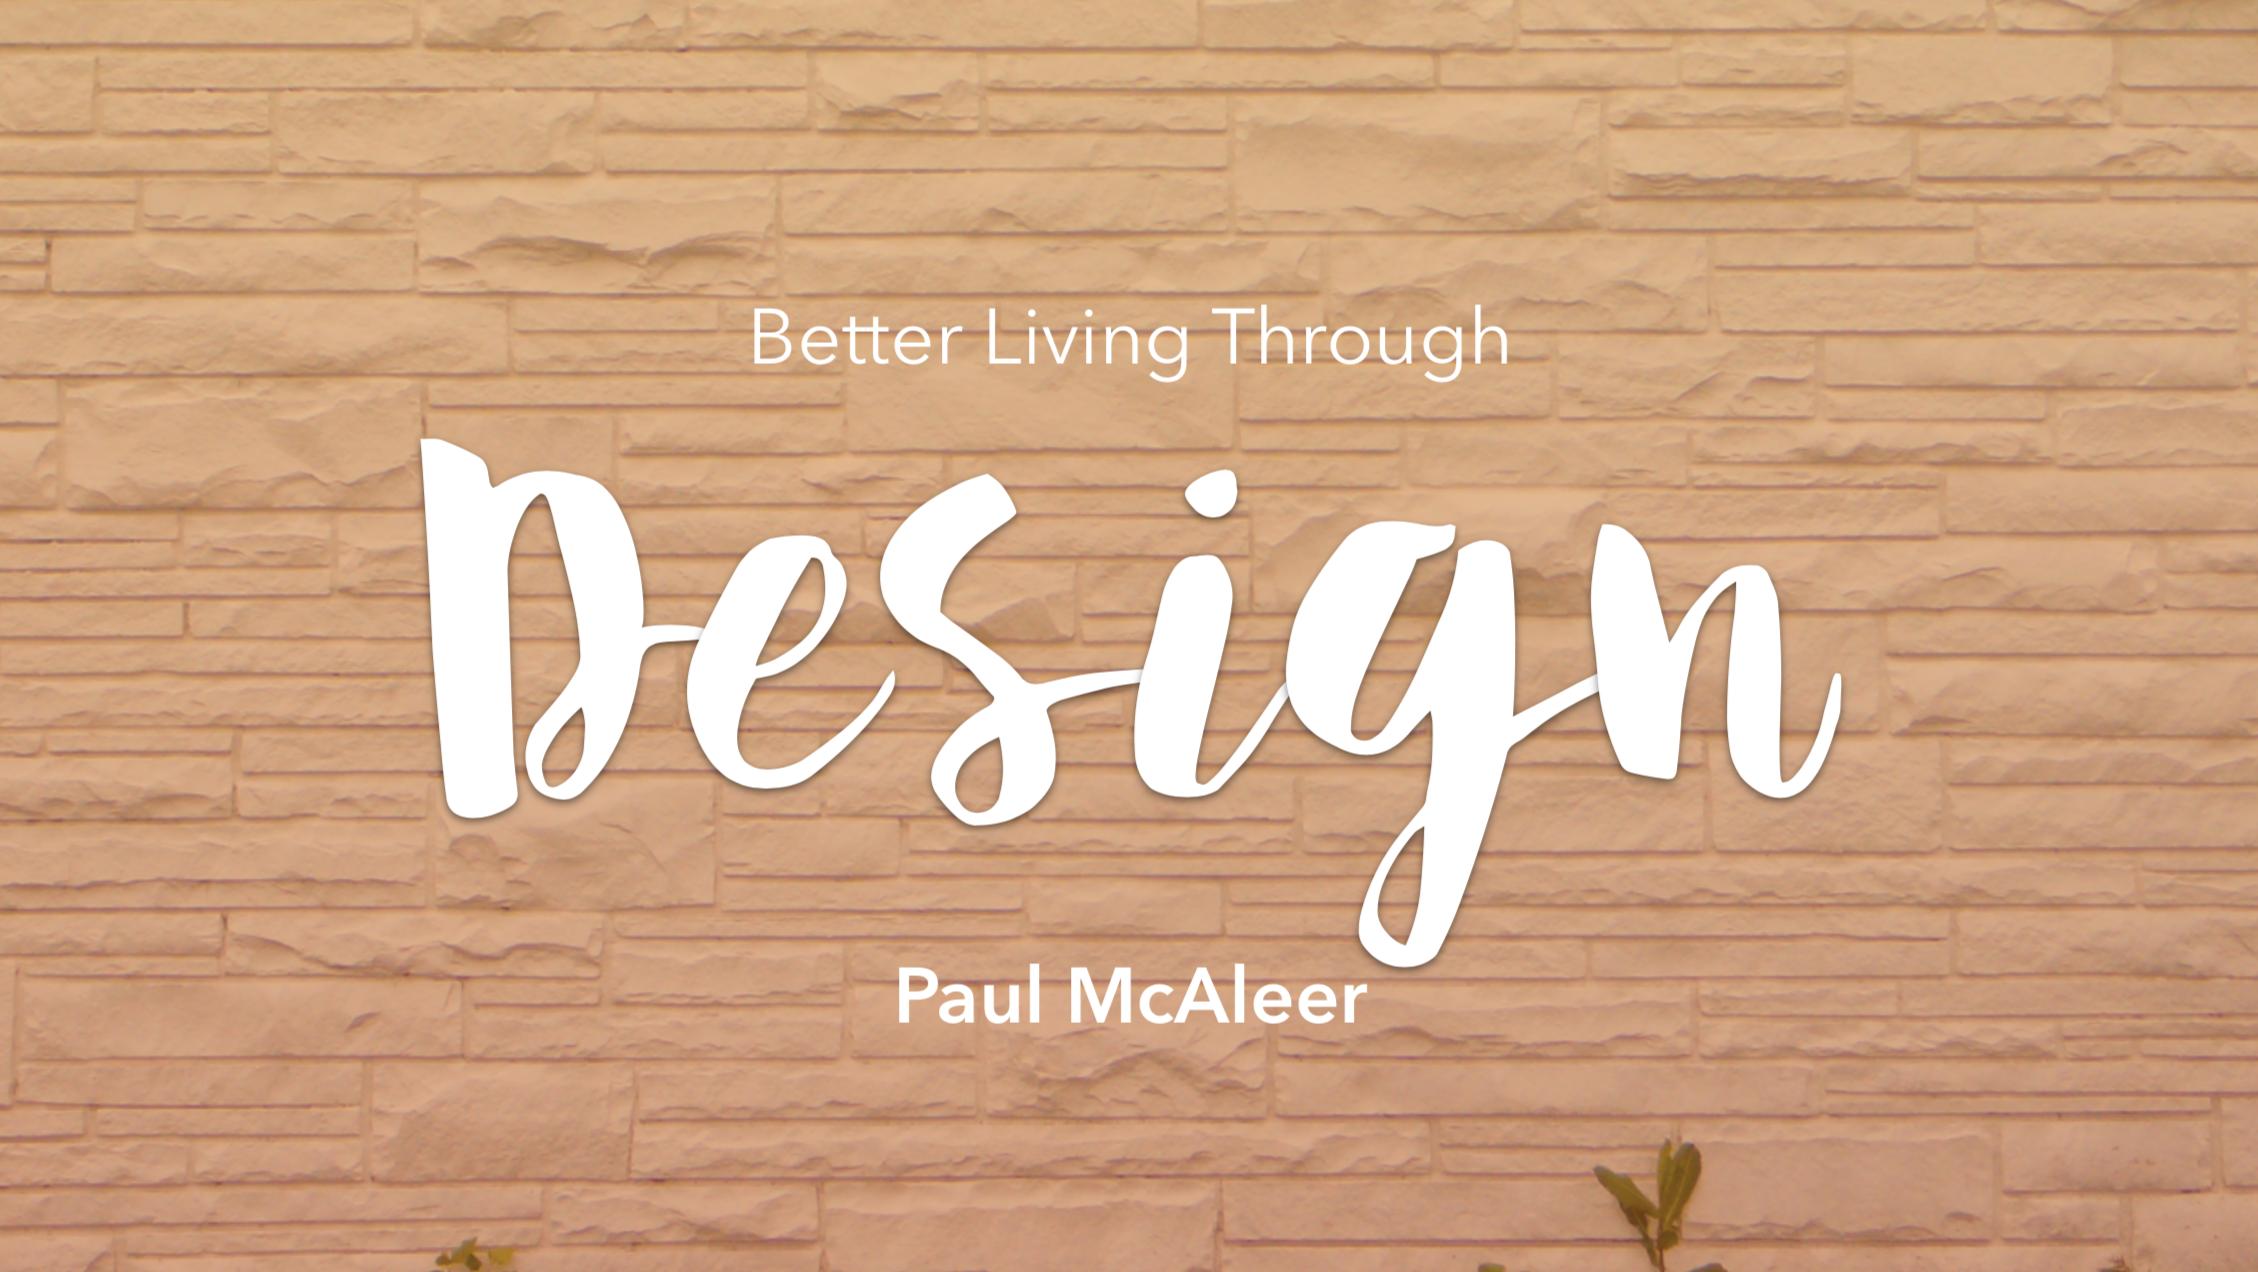 Better Living Through Design , 2014.